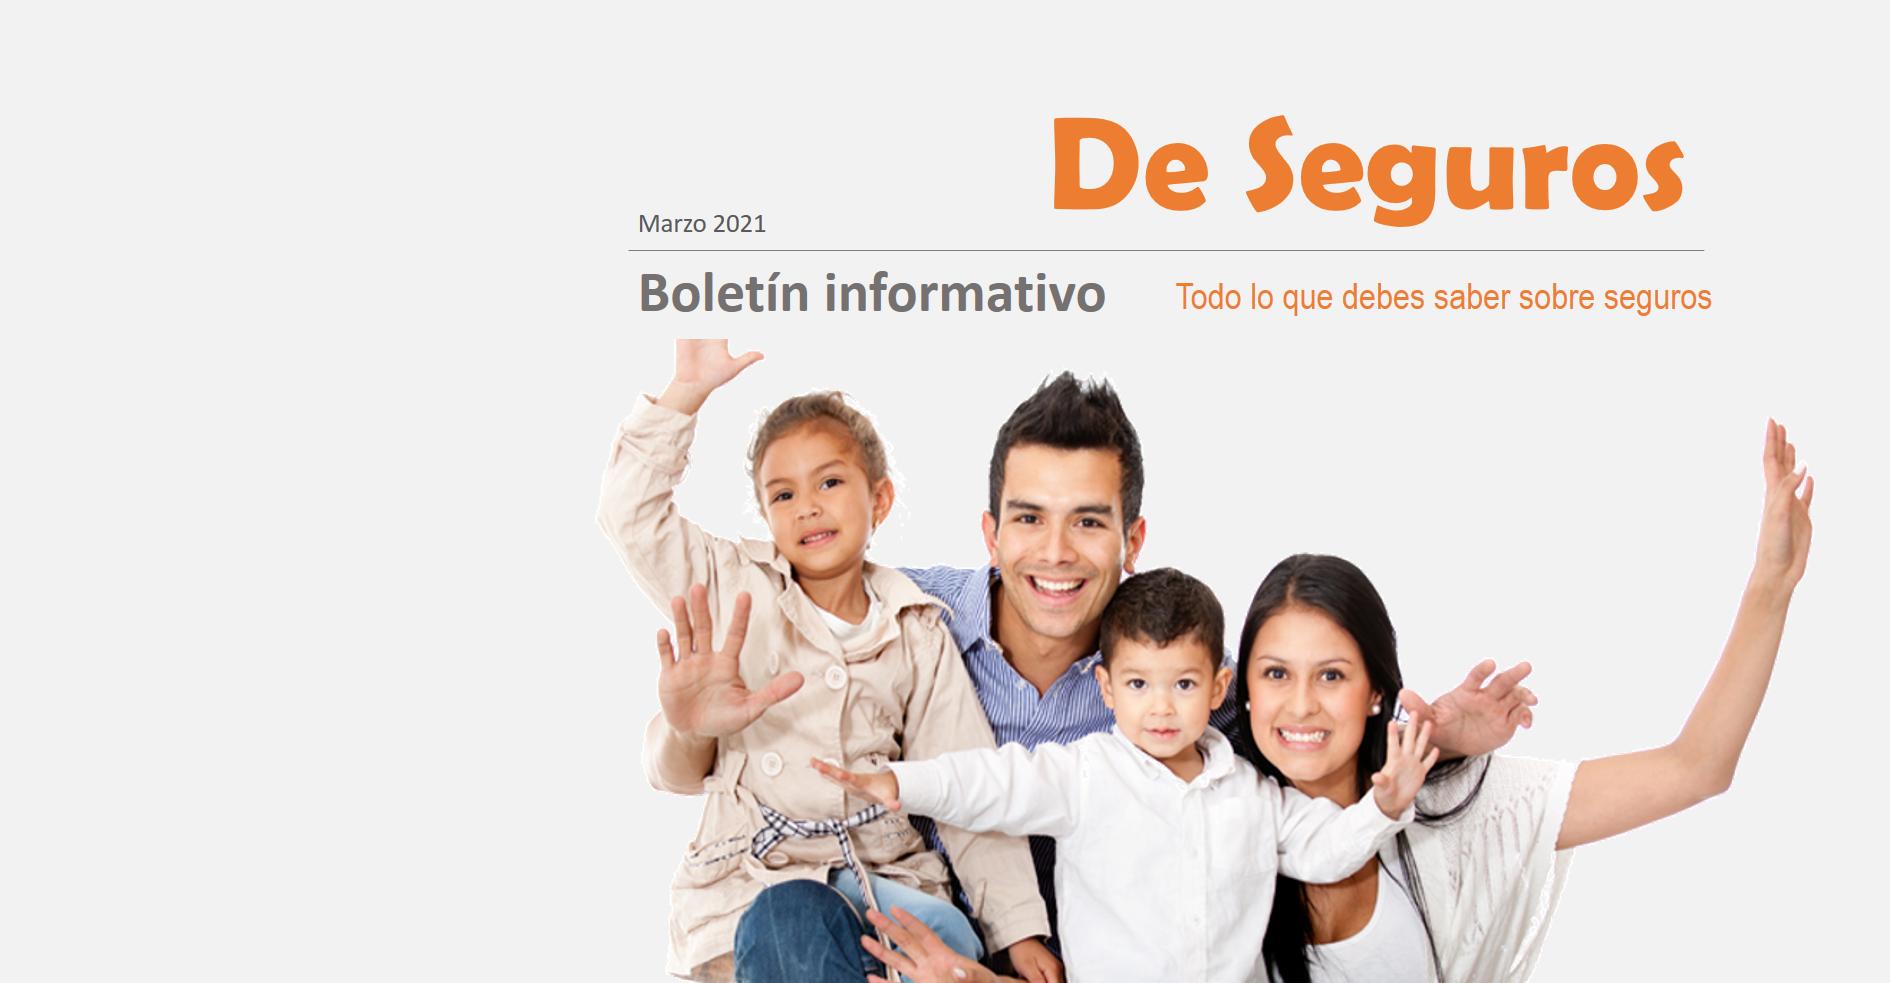 Boletín Informativo Digital - De Seguros. Edición Marzo 2021